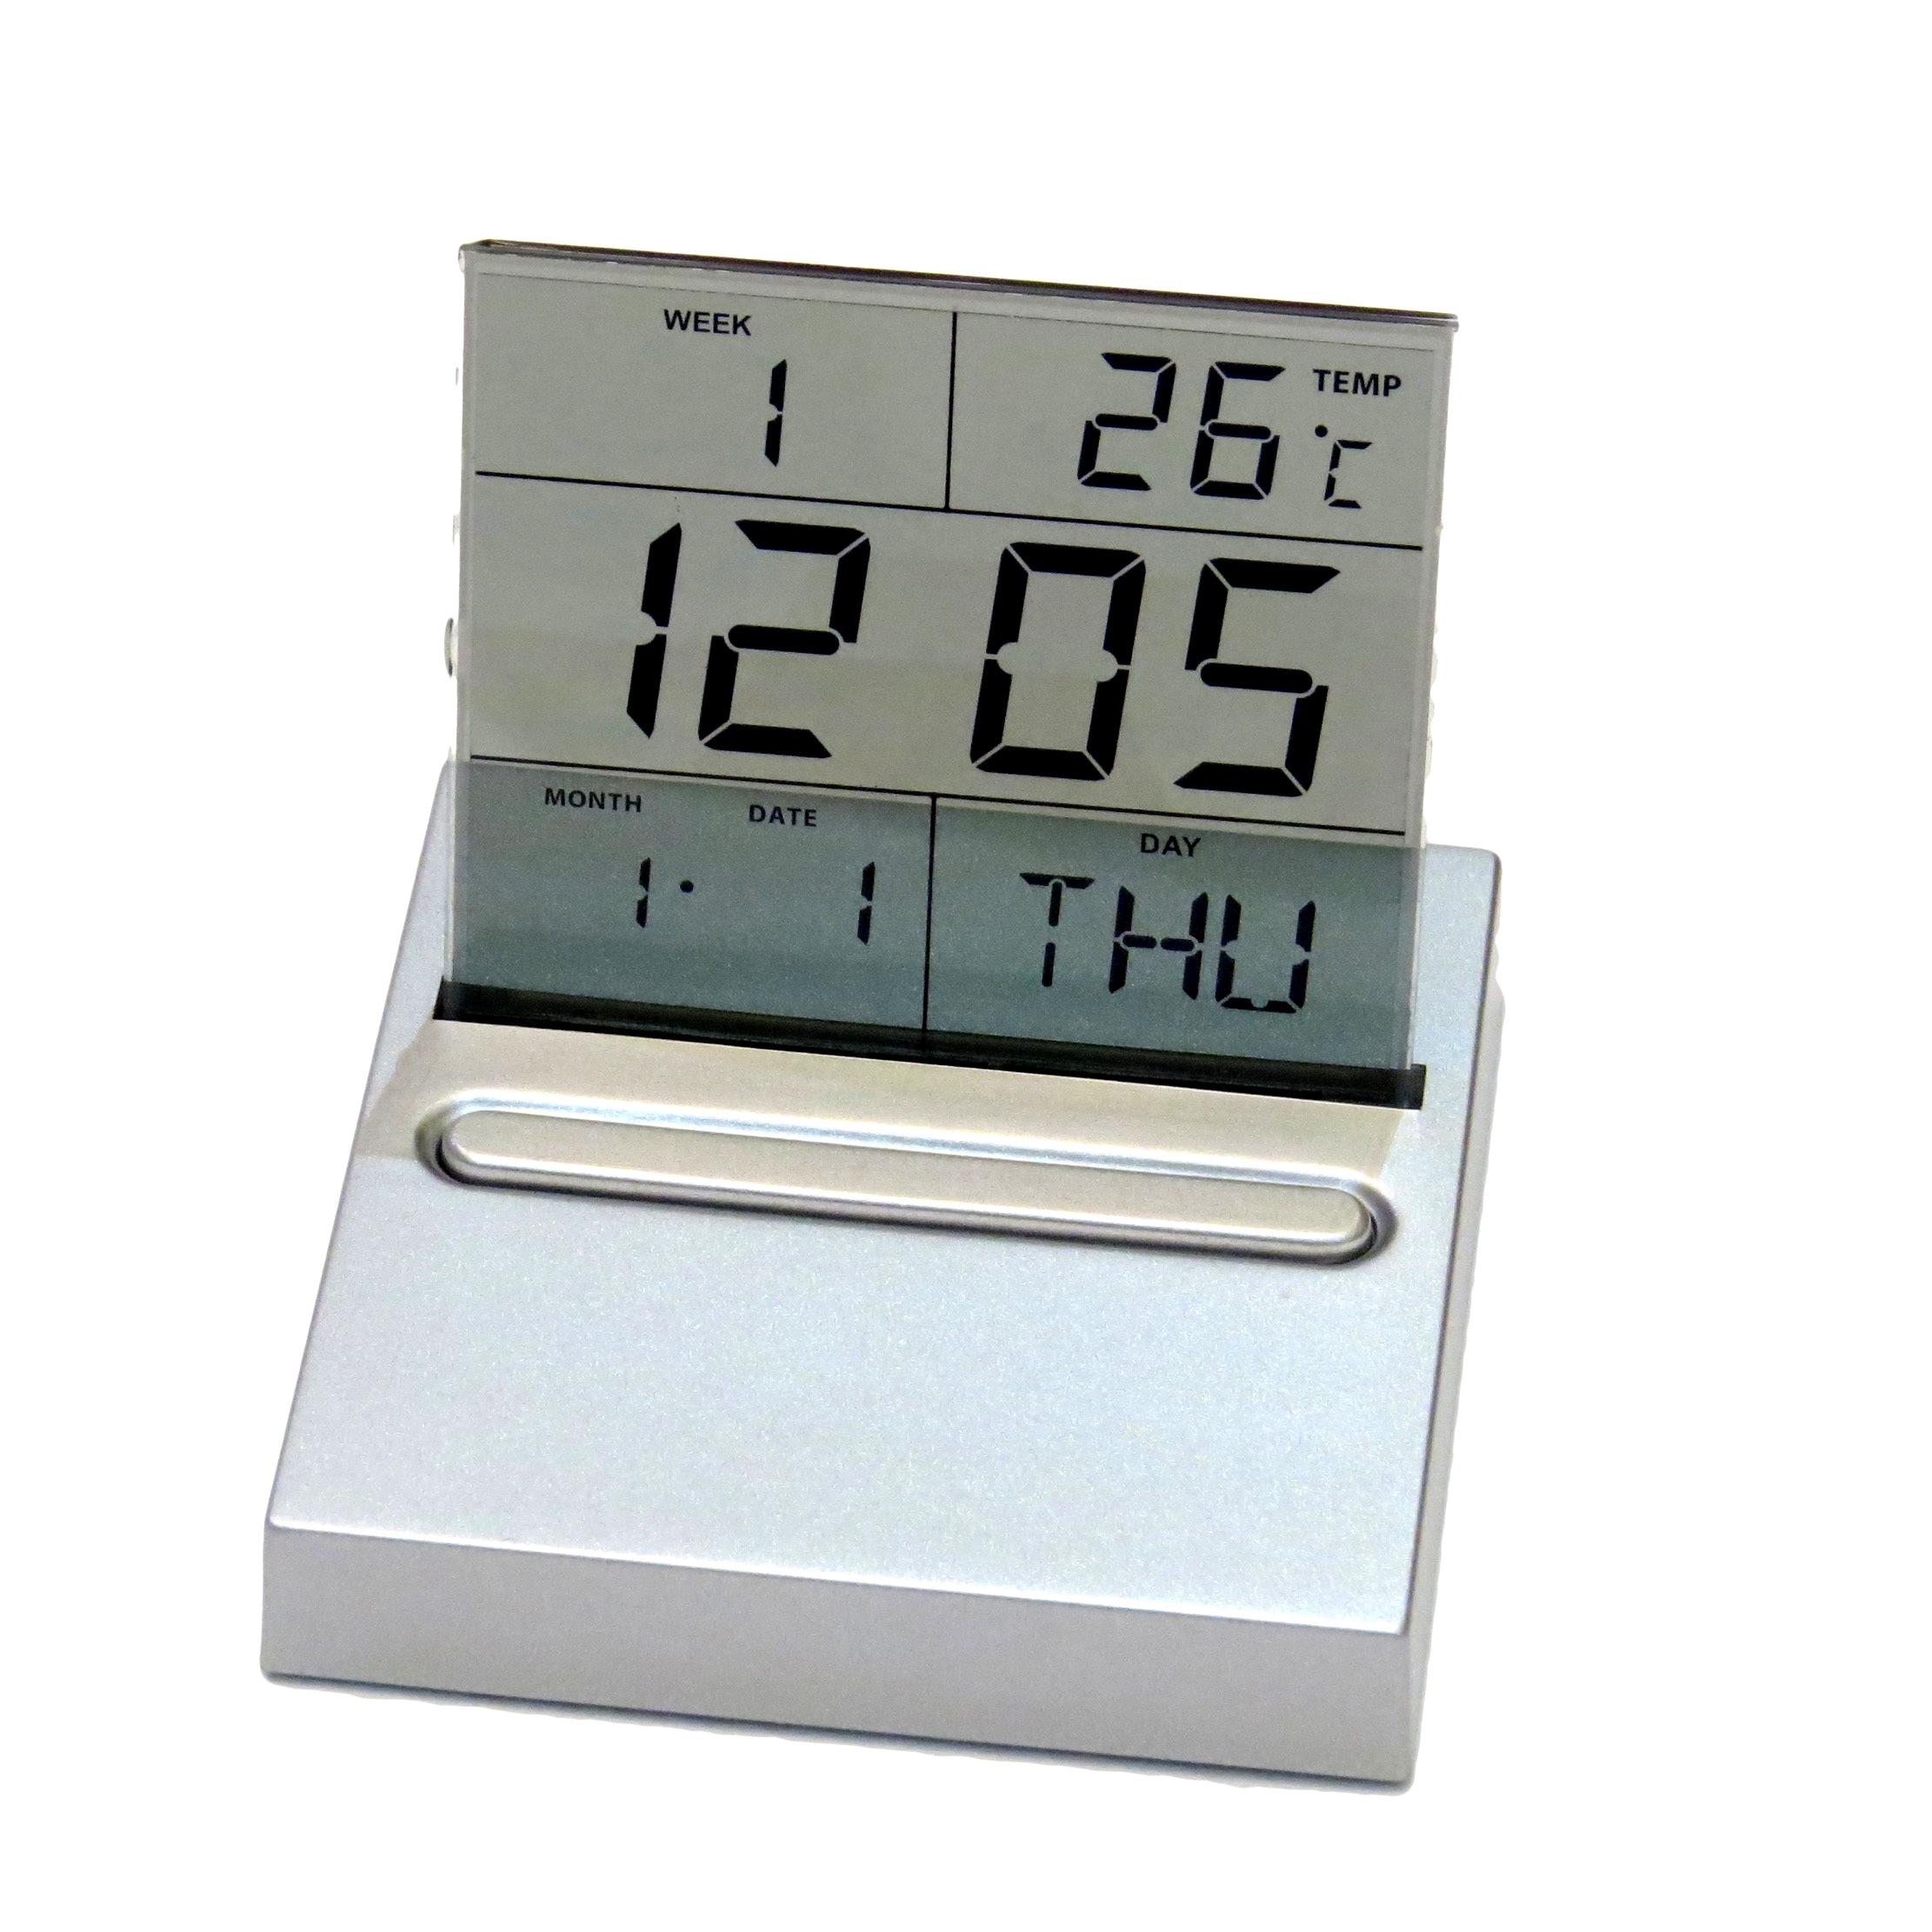 ساعت رومیزی لکسون مدل LR 95